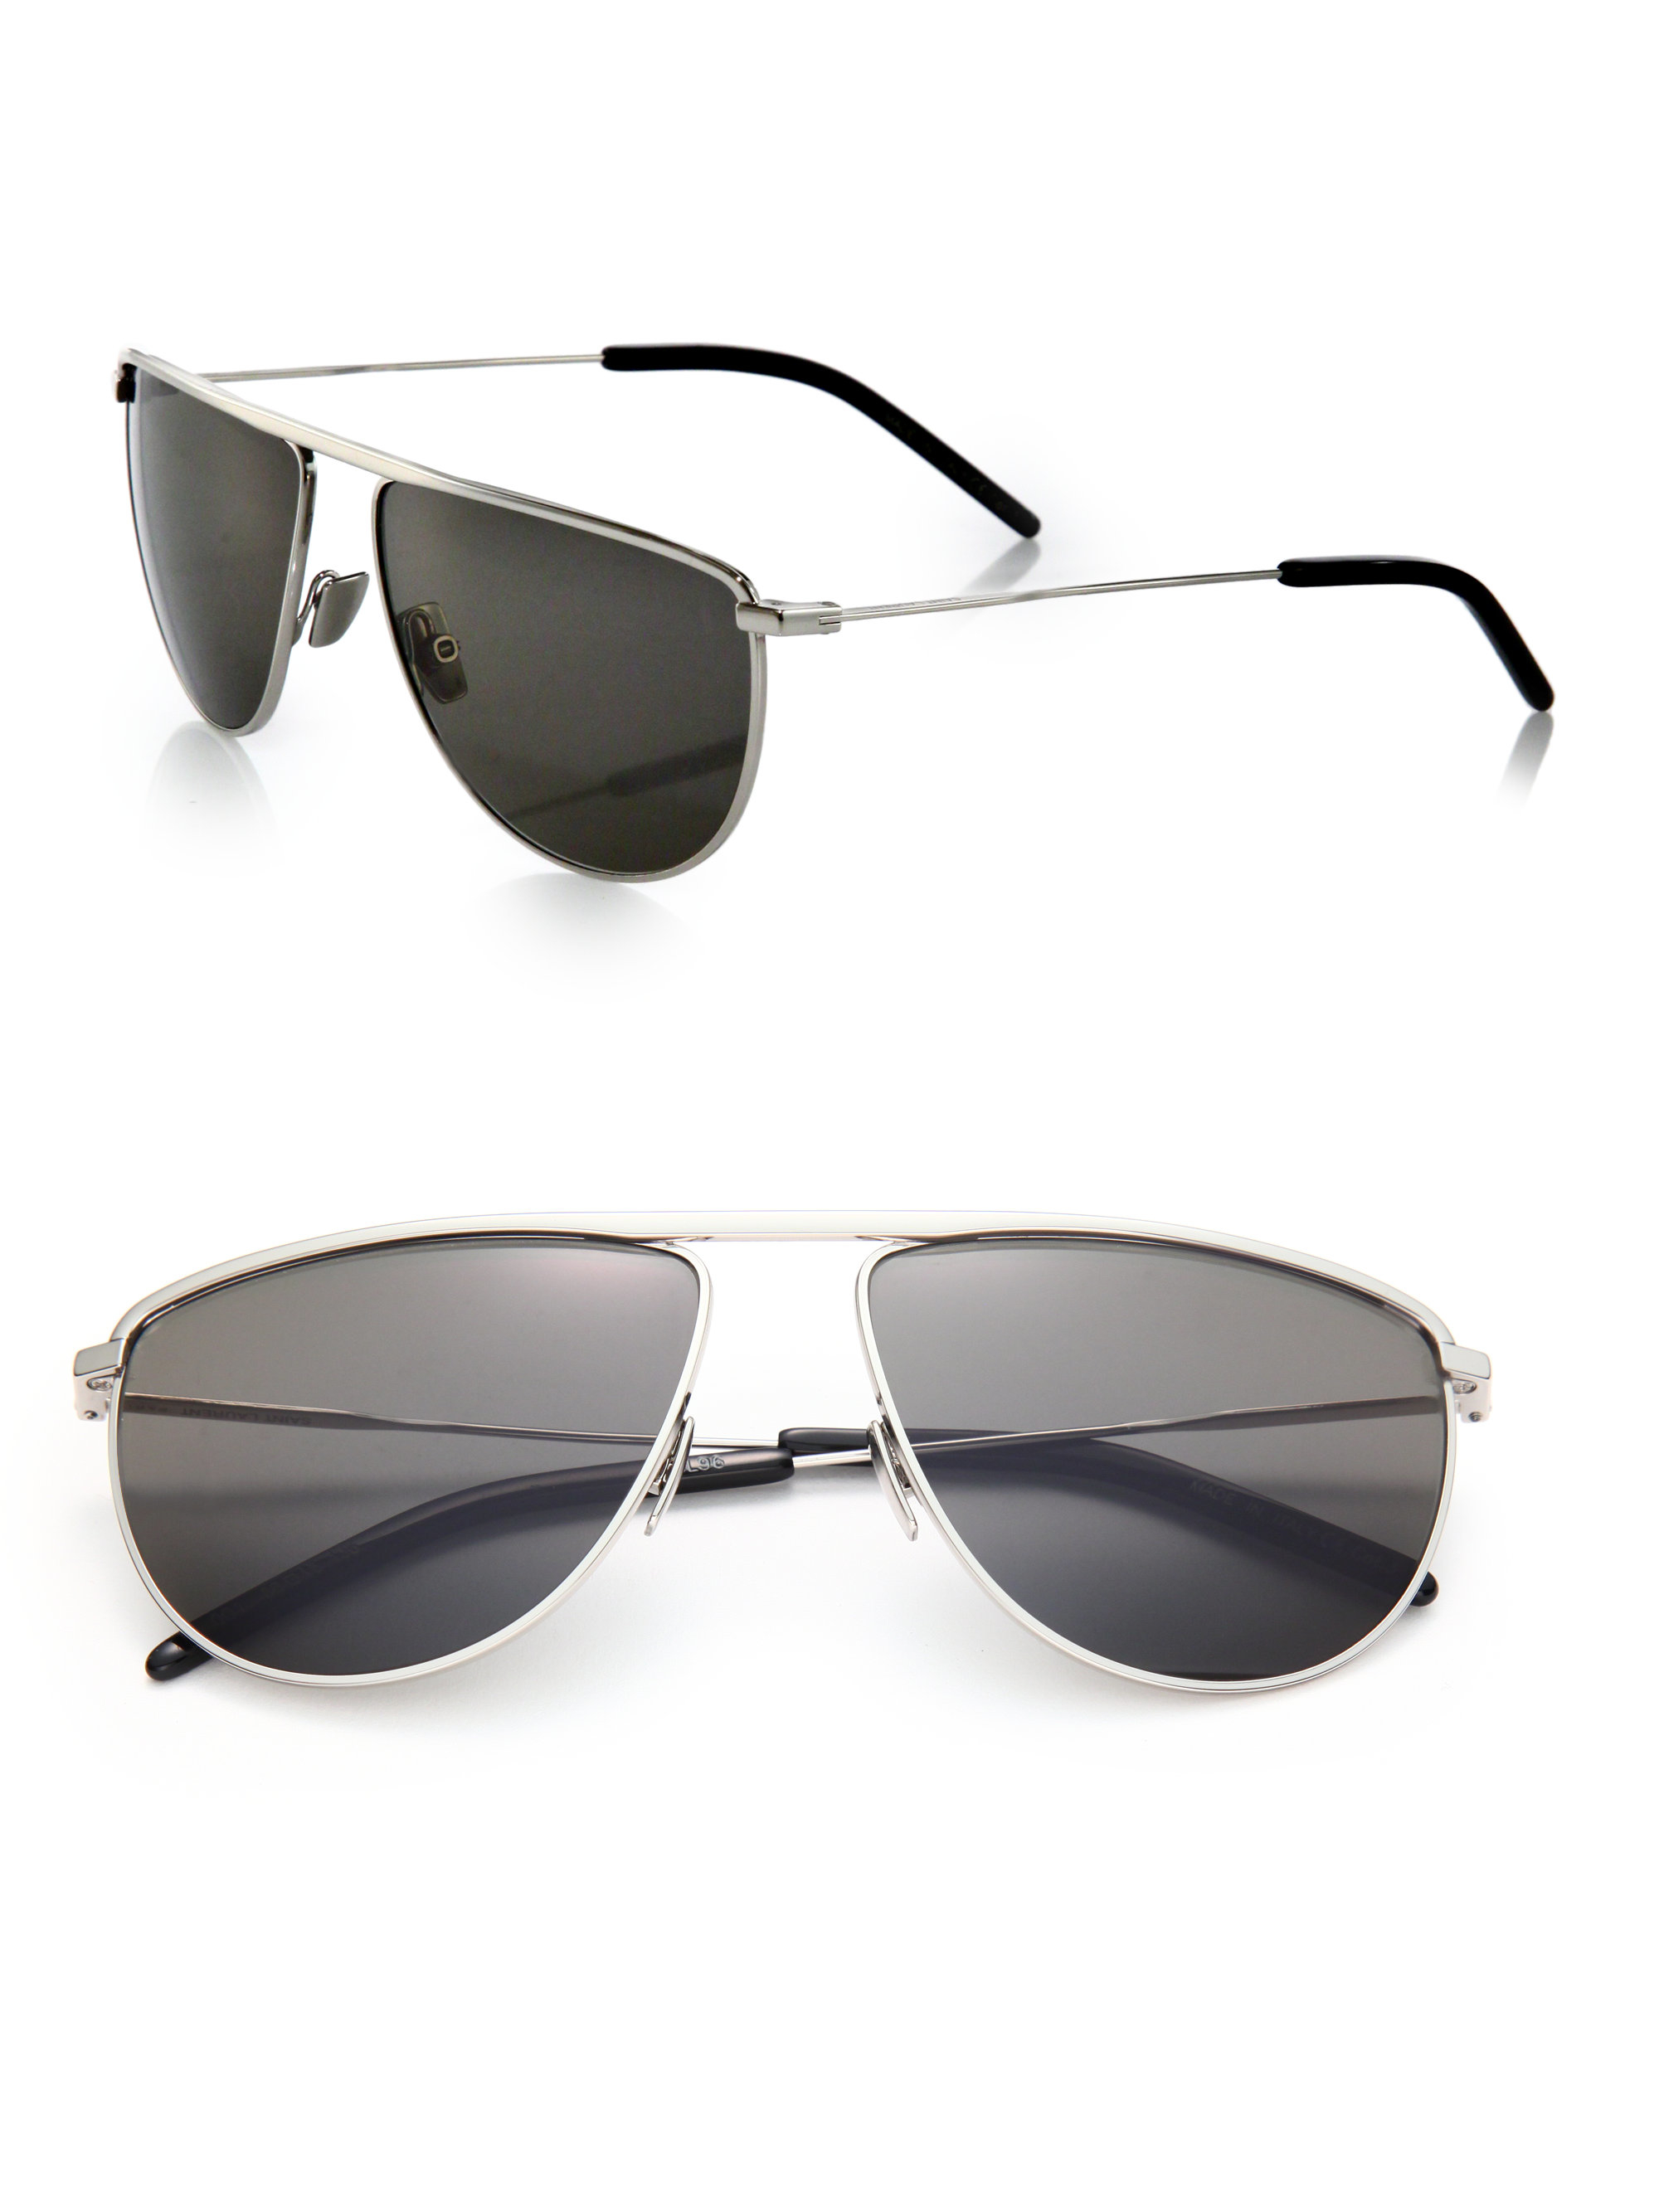 166c4fee8e Lyst - Saint Laurent 58mm Flat-top Pilot Sunglasses in Metallic for Men